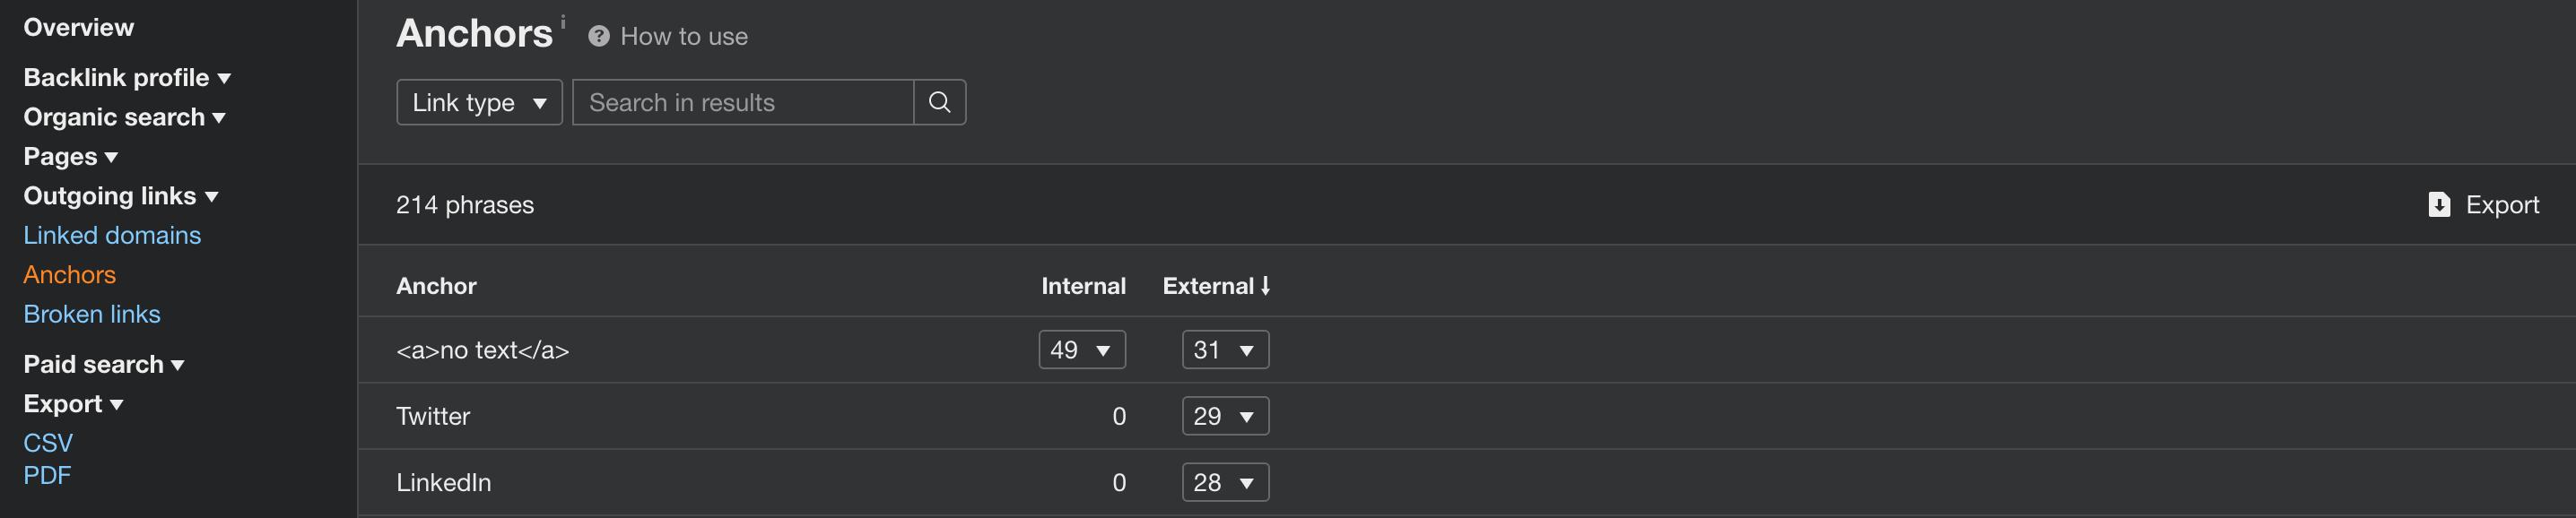 site explorer anchors report in ahrefs webmaster tools